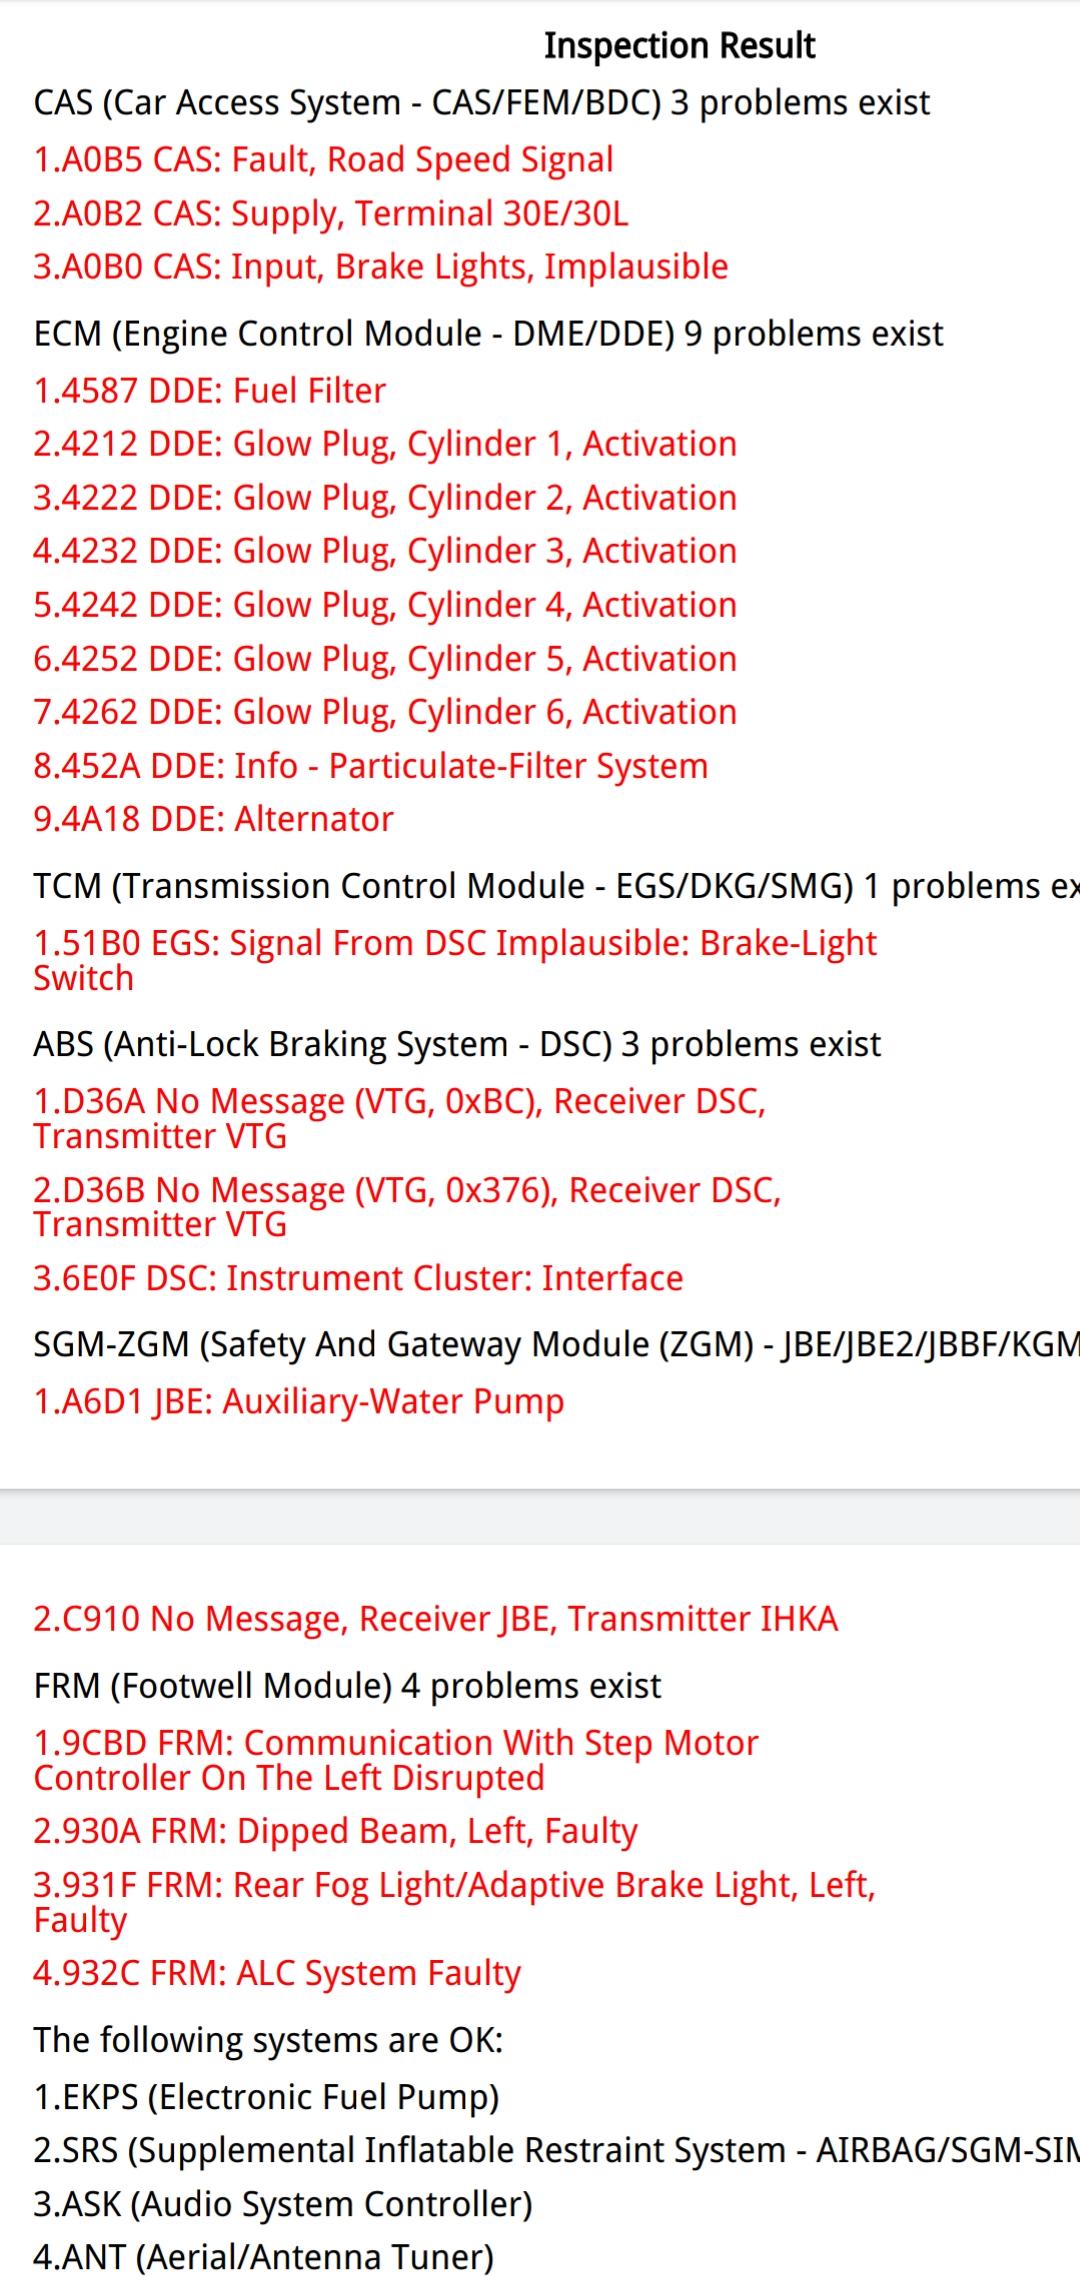 Screenshot_20210928_230845_com.google.android.apps.docs.jpg